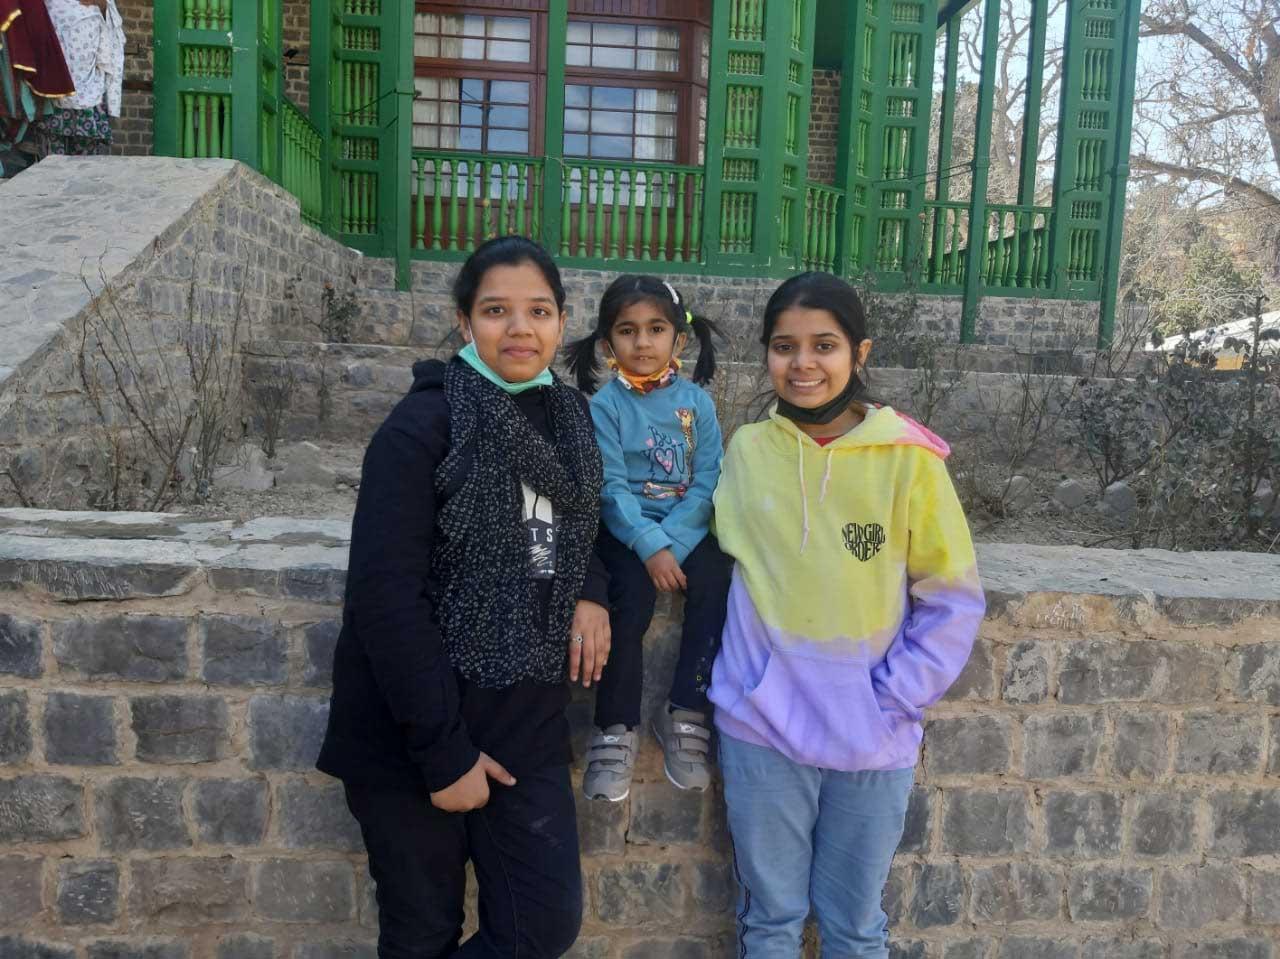 Zoya, Ayesha and Zara having fun outside of the Ziarat Residency.